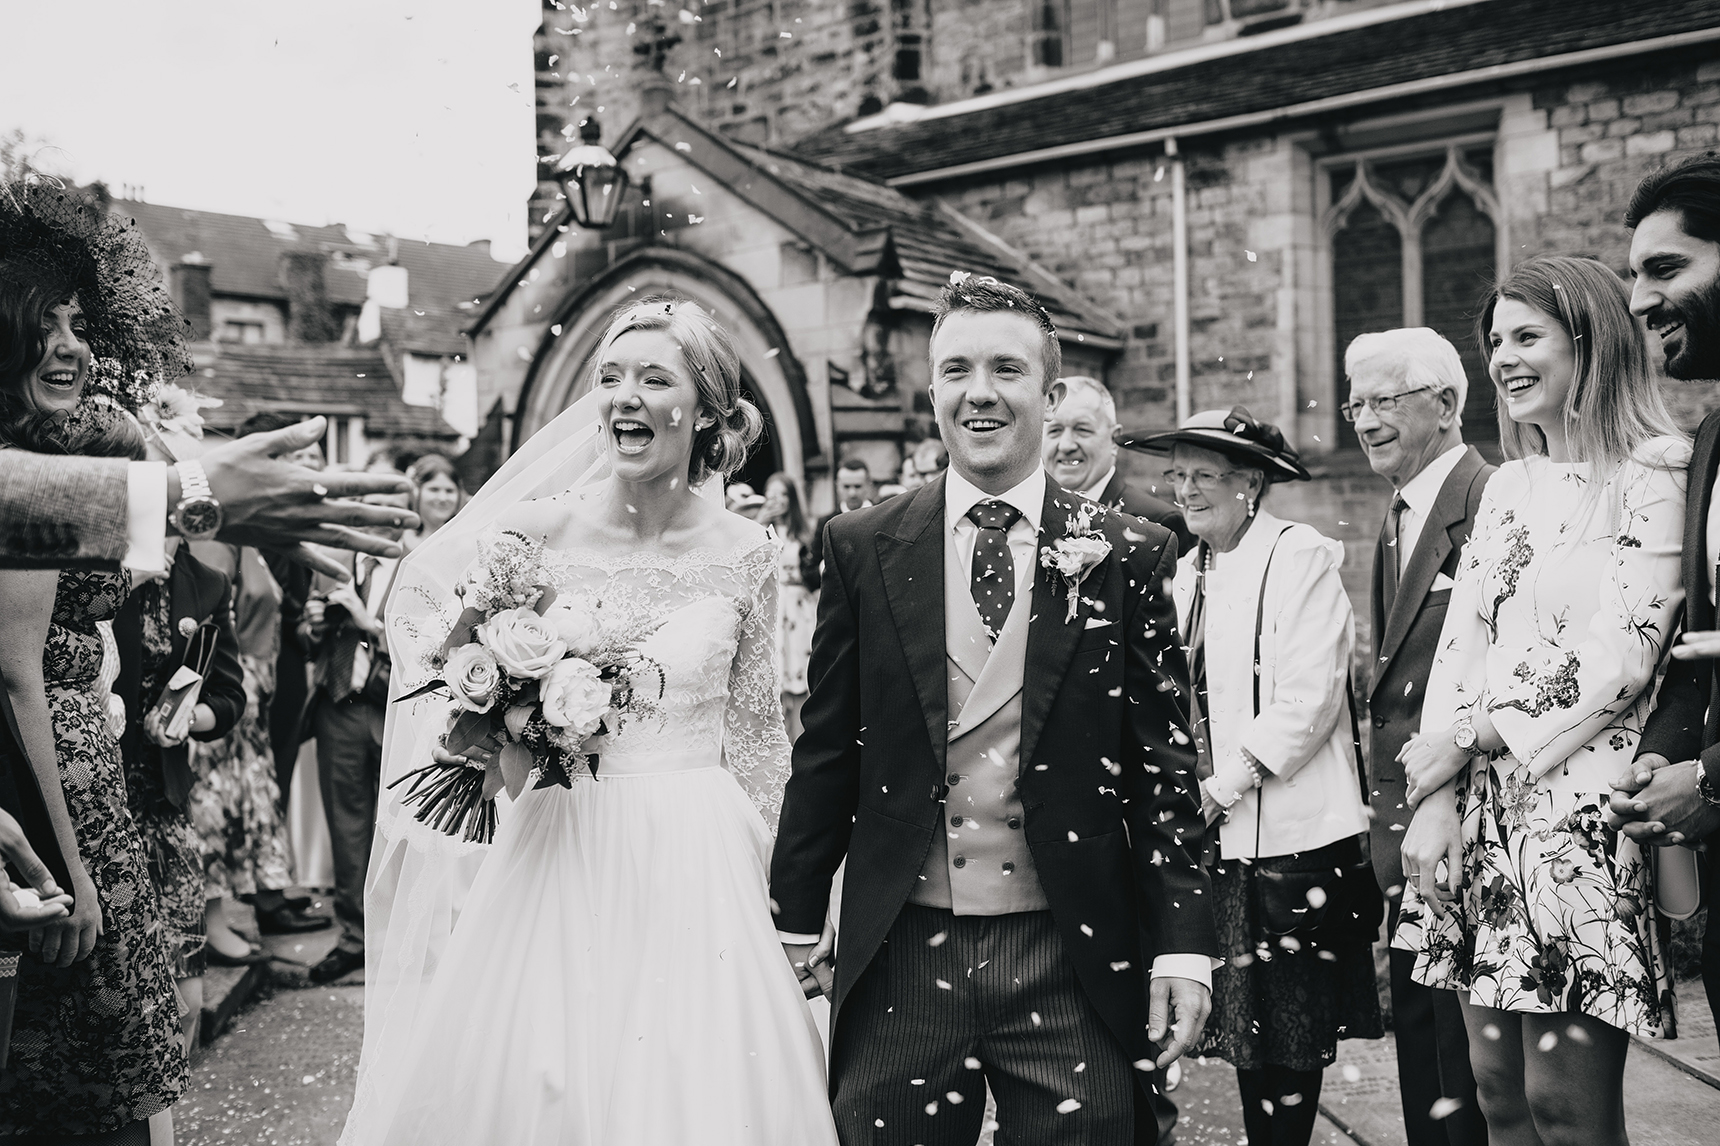 Best Keighley wedding photographer